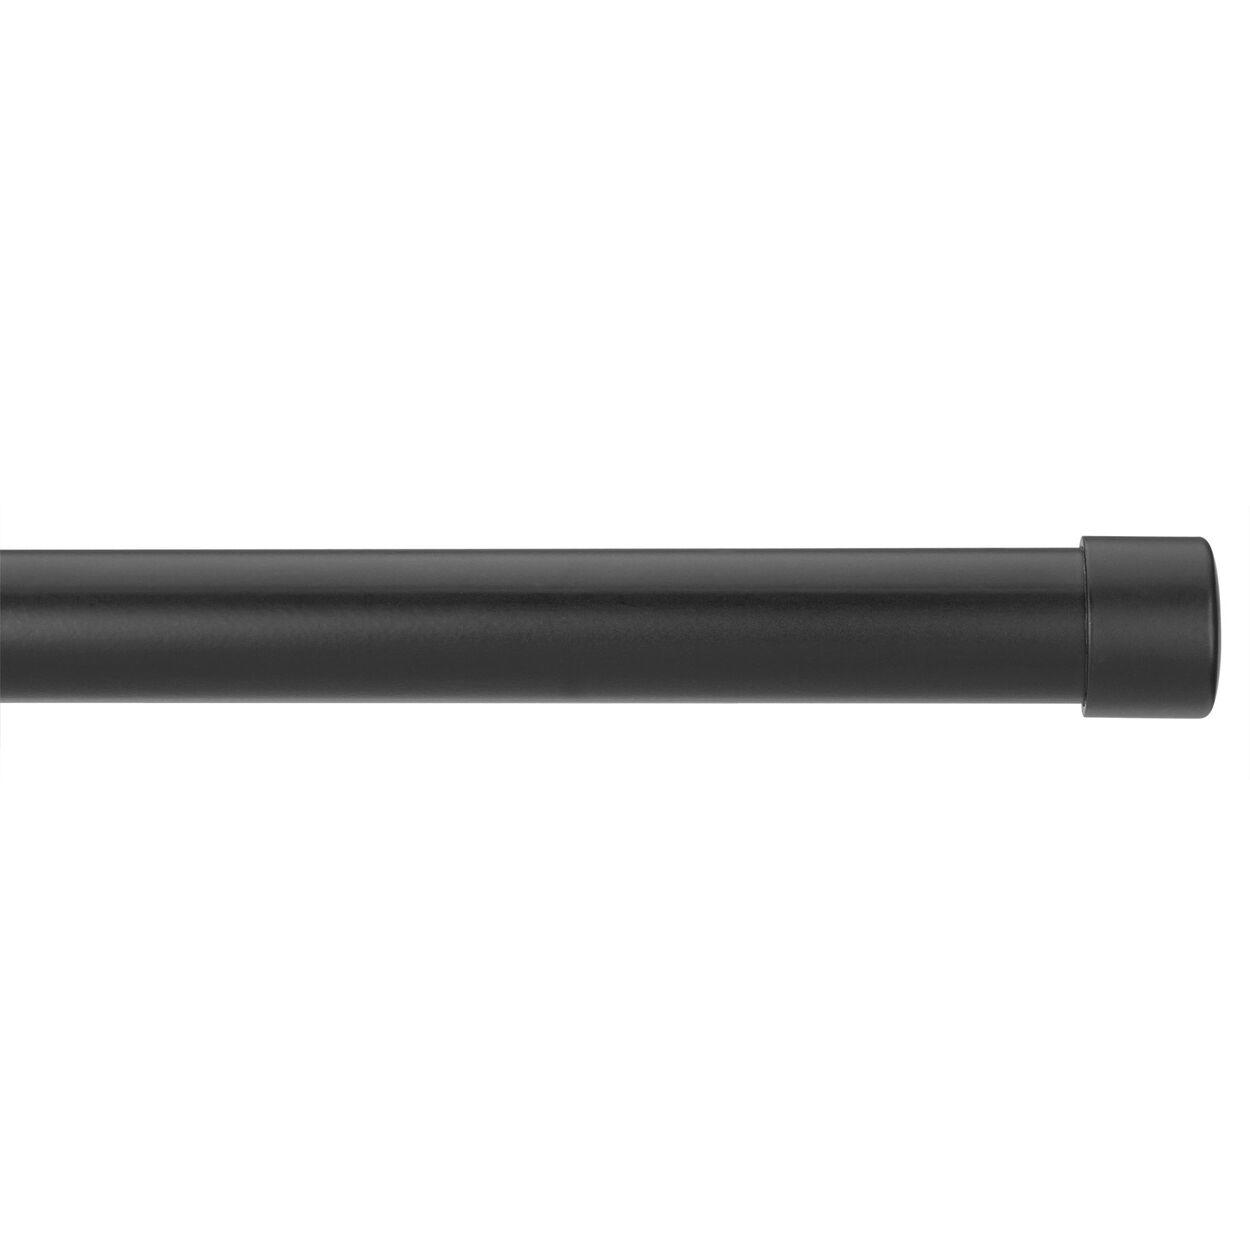 Curtain Rod Set - Diameter 25/28 mm